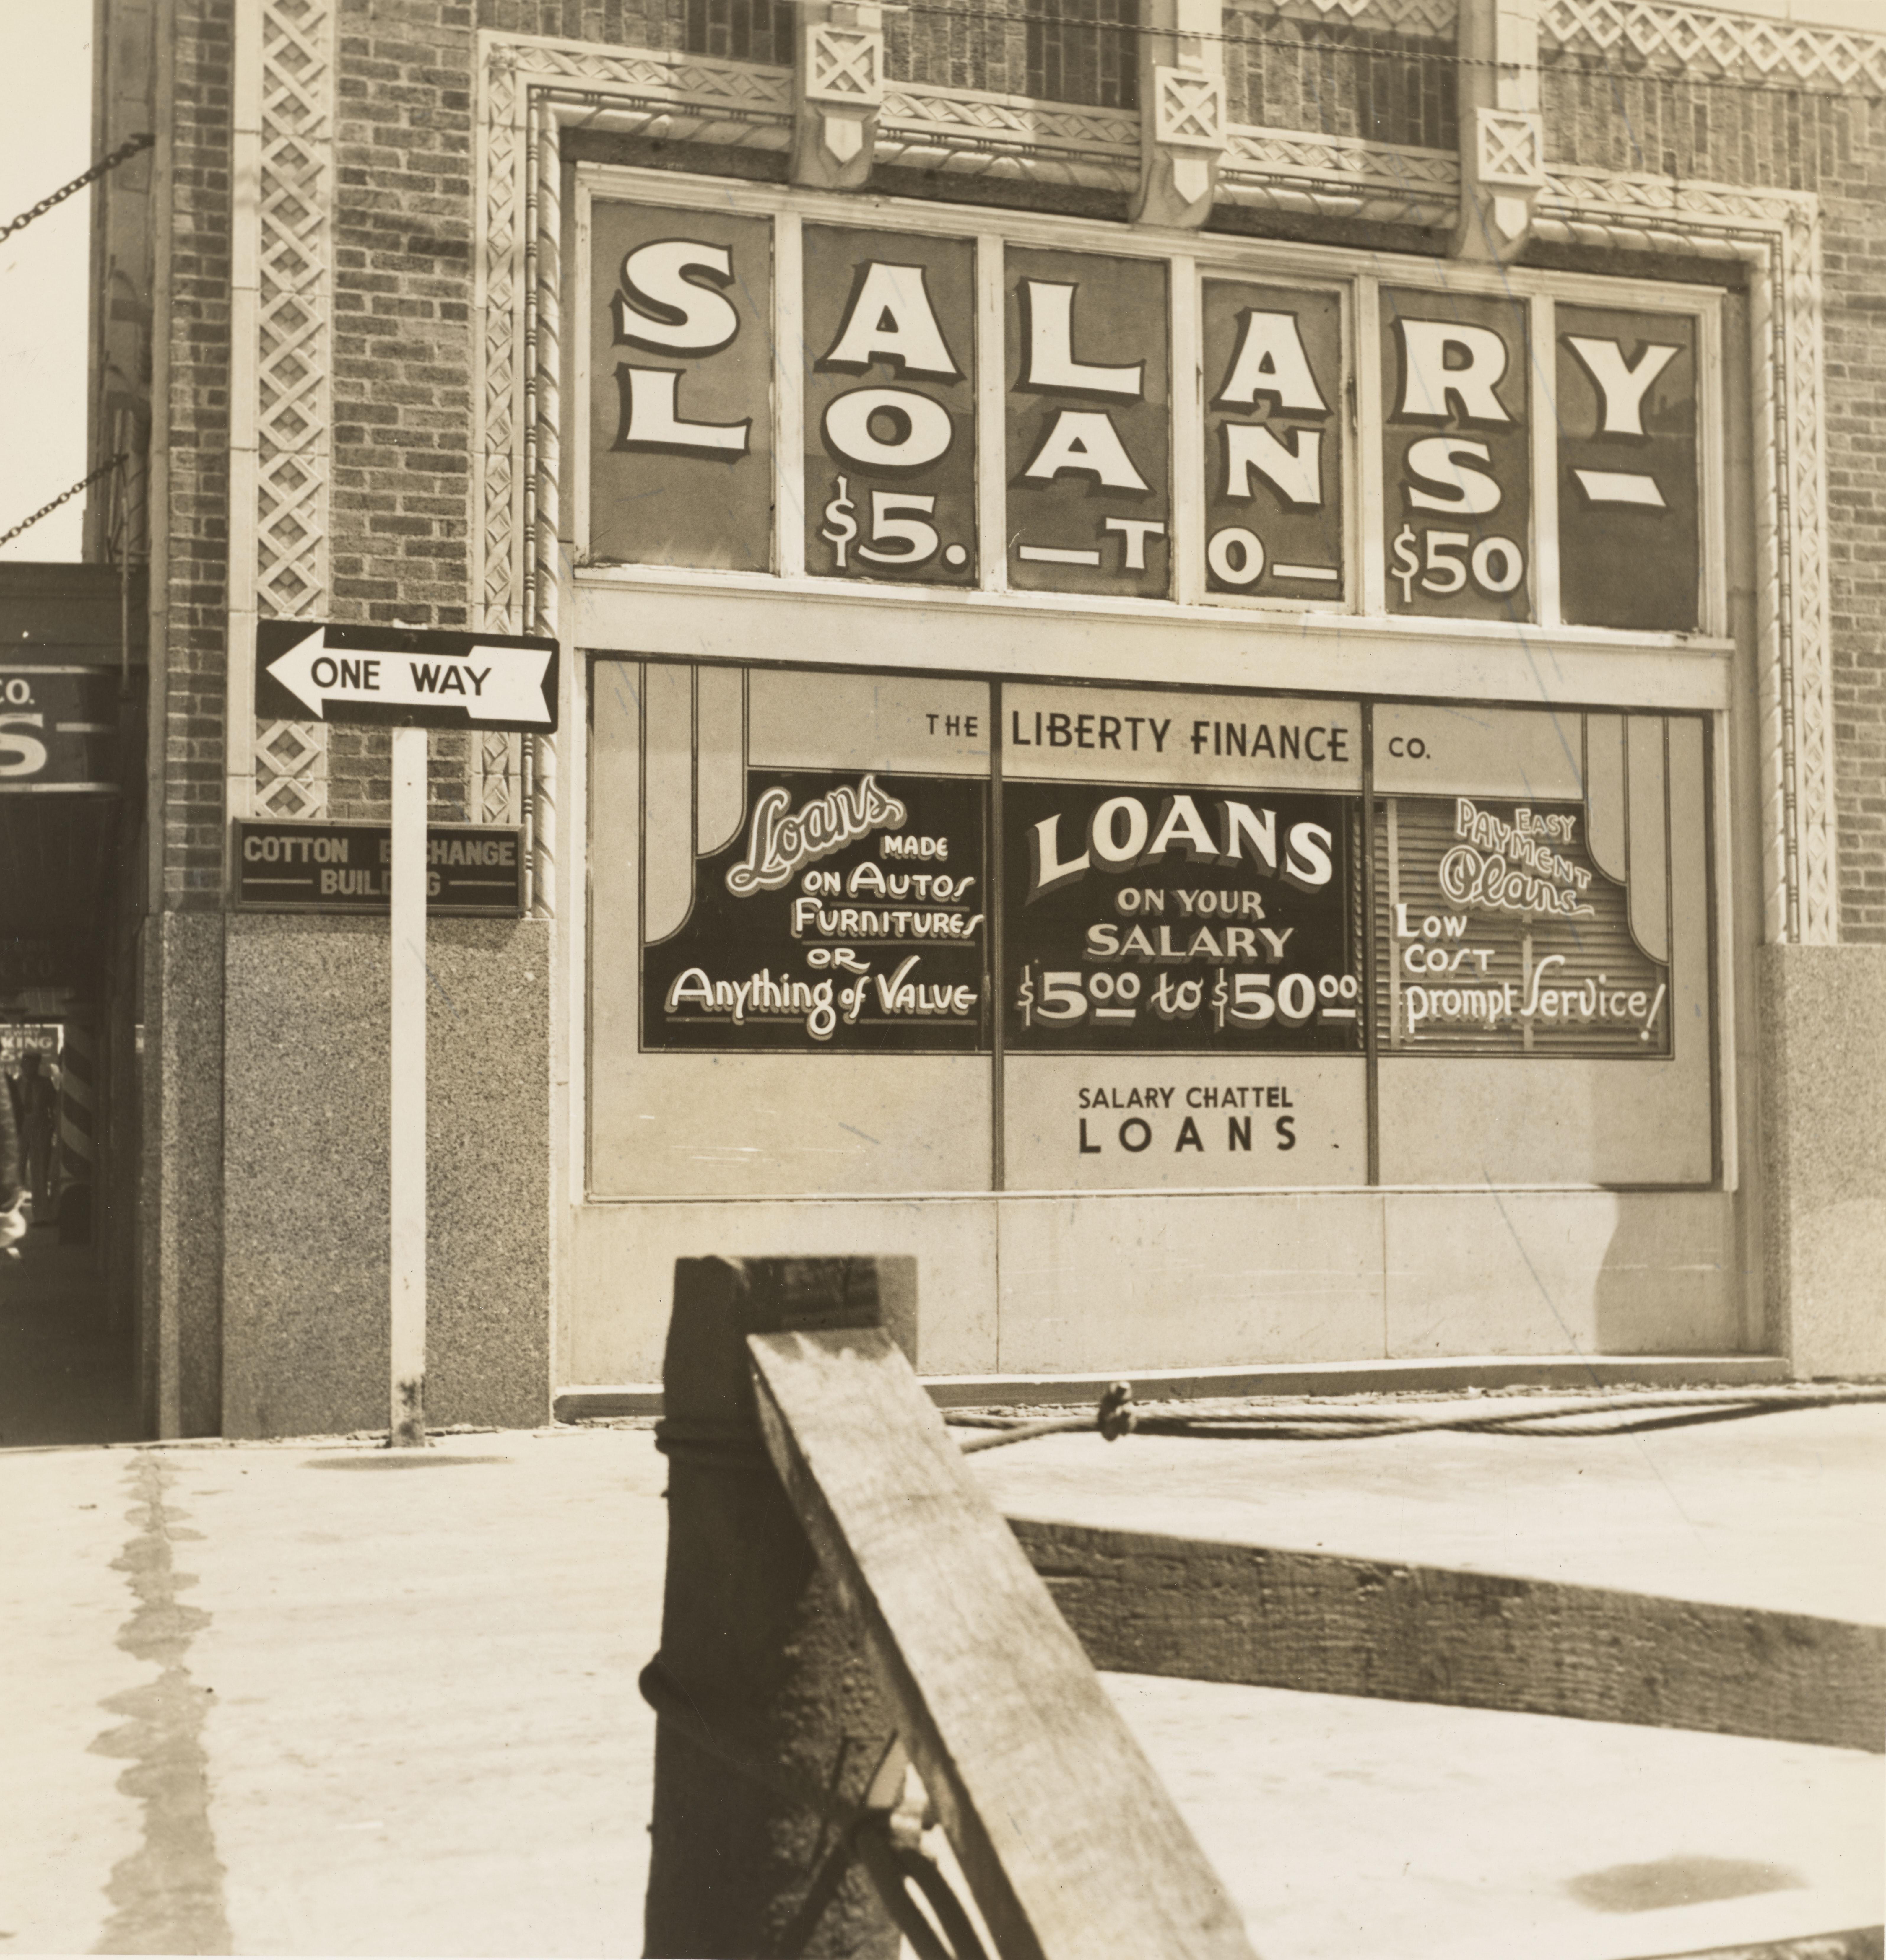 salary loans old photo bank loans cares act